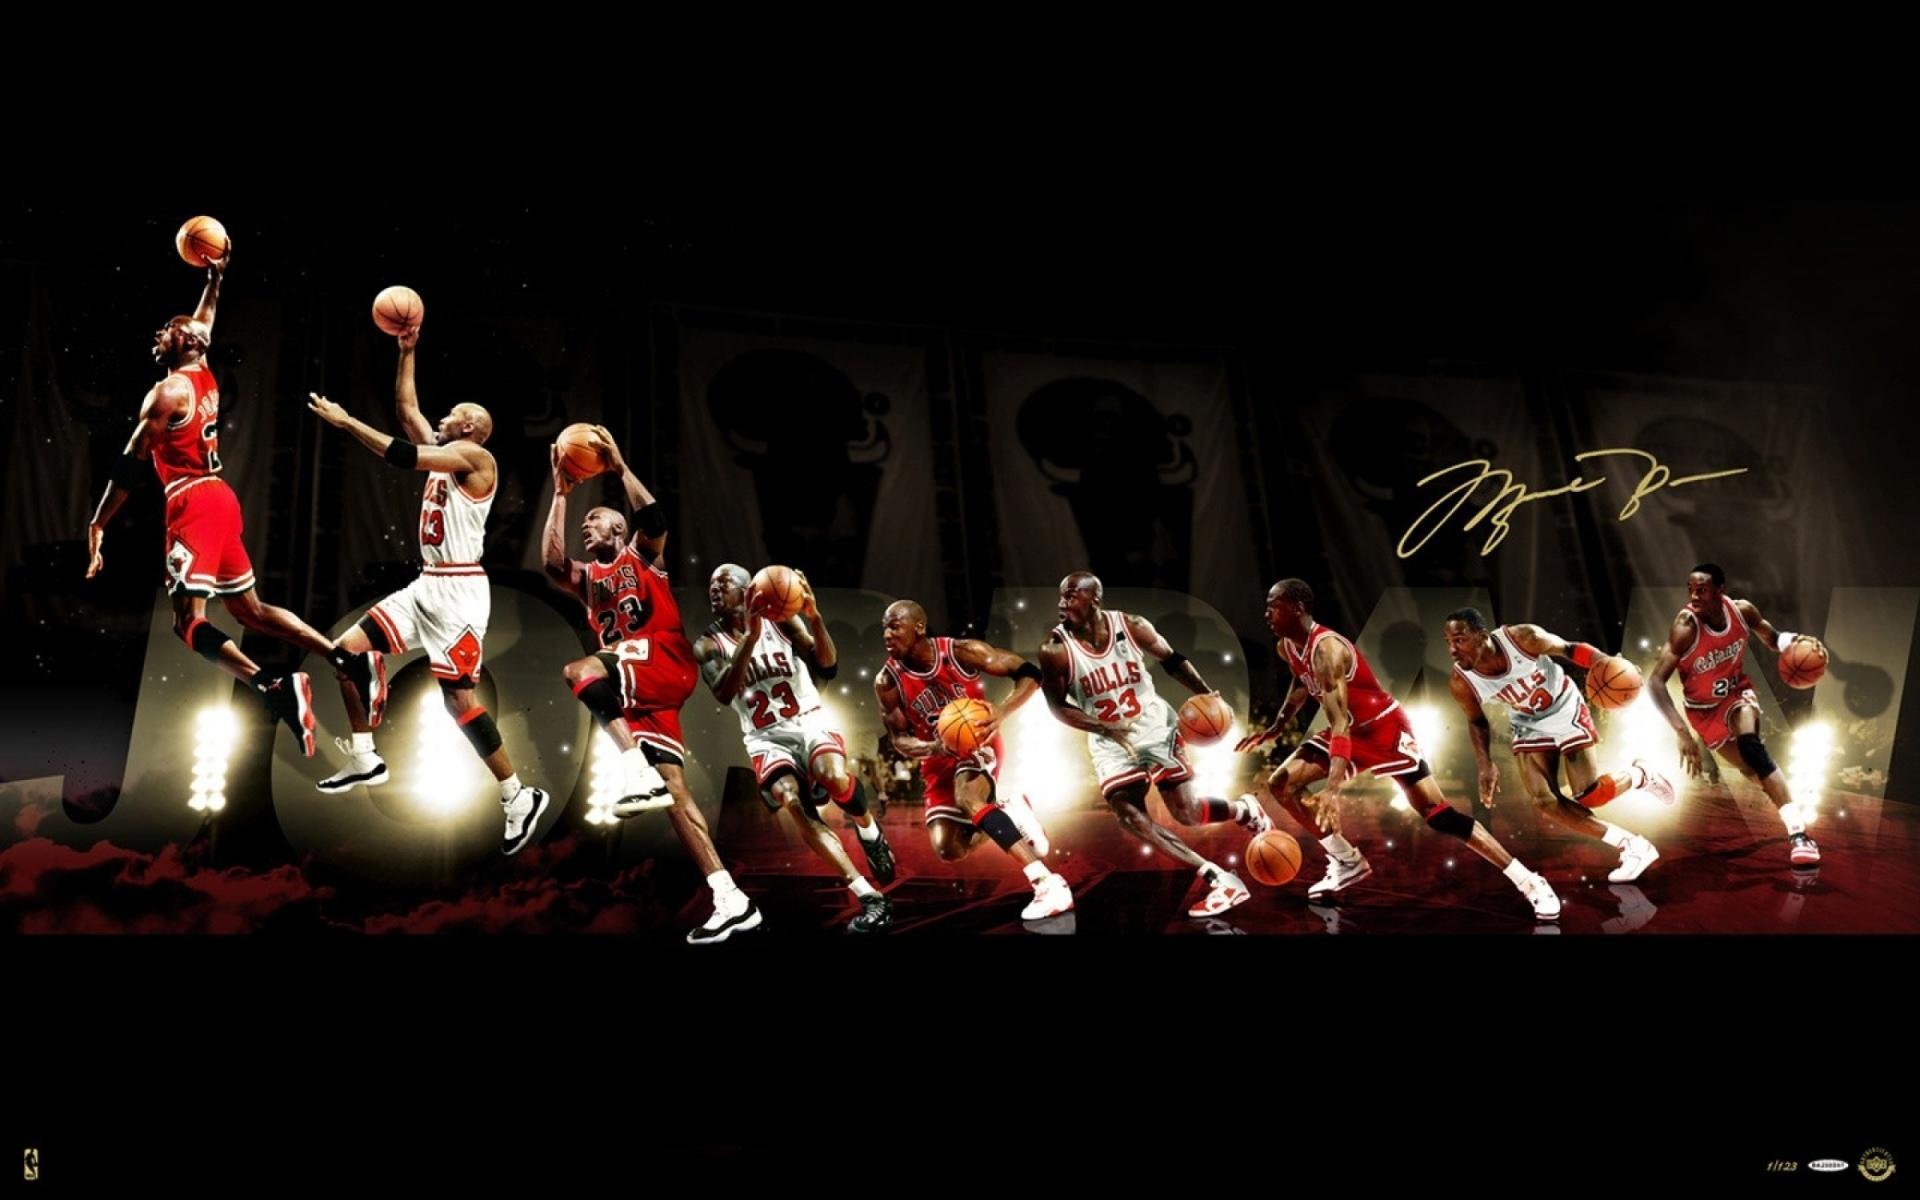 Michael Jordan wallpapers HD quality